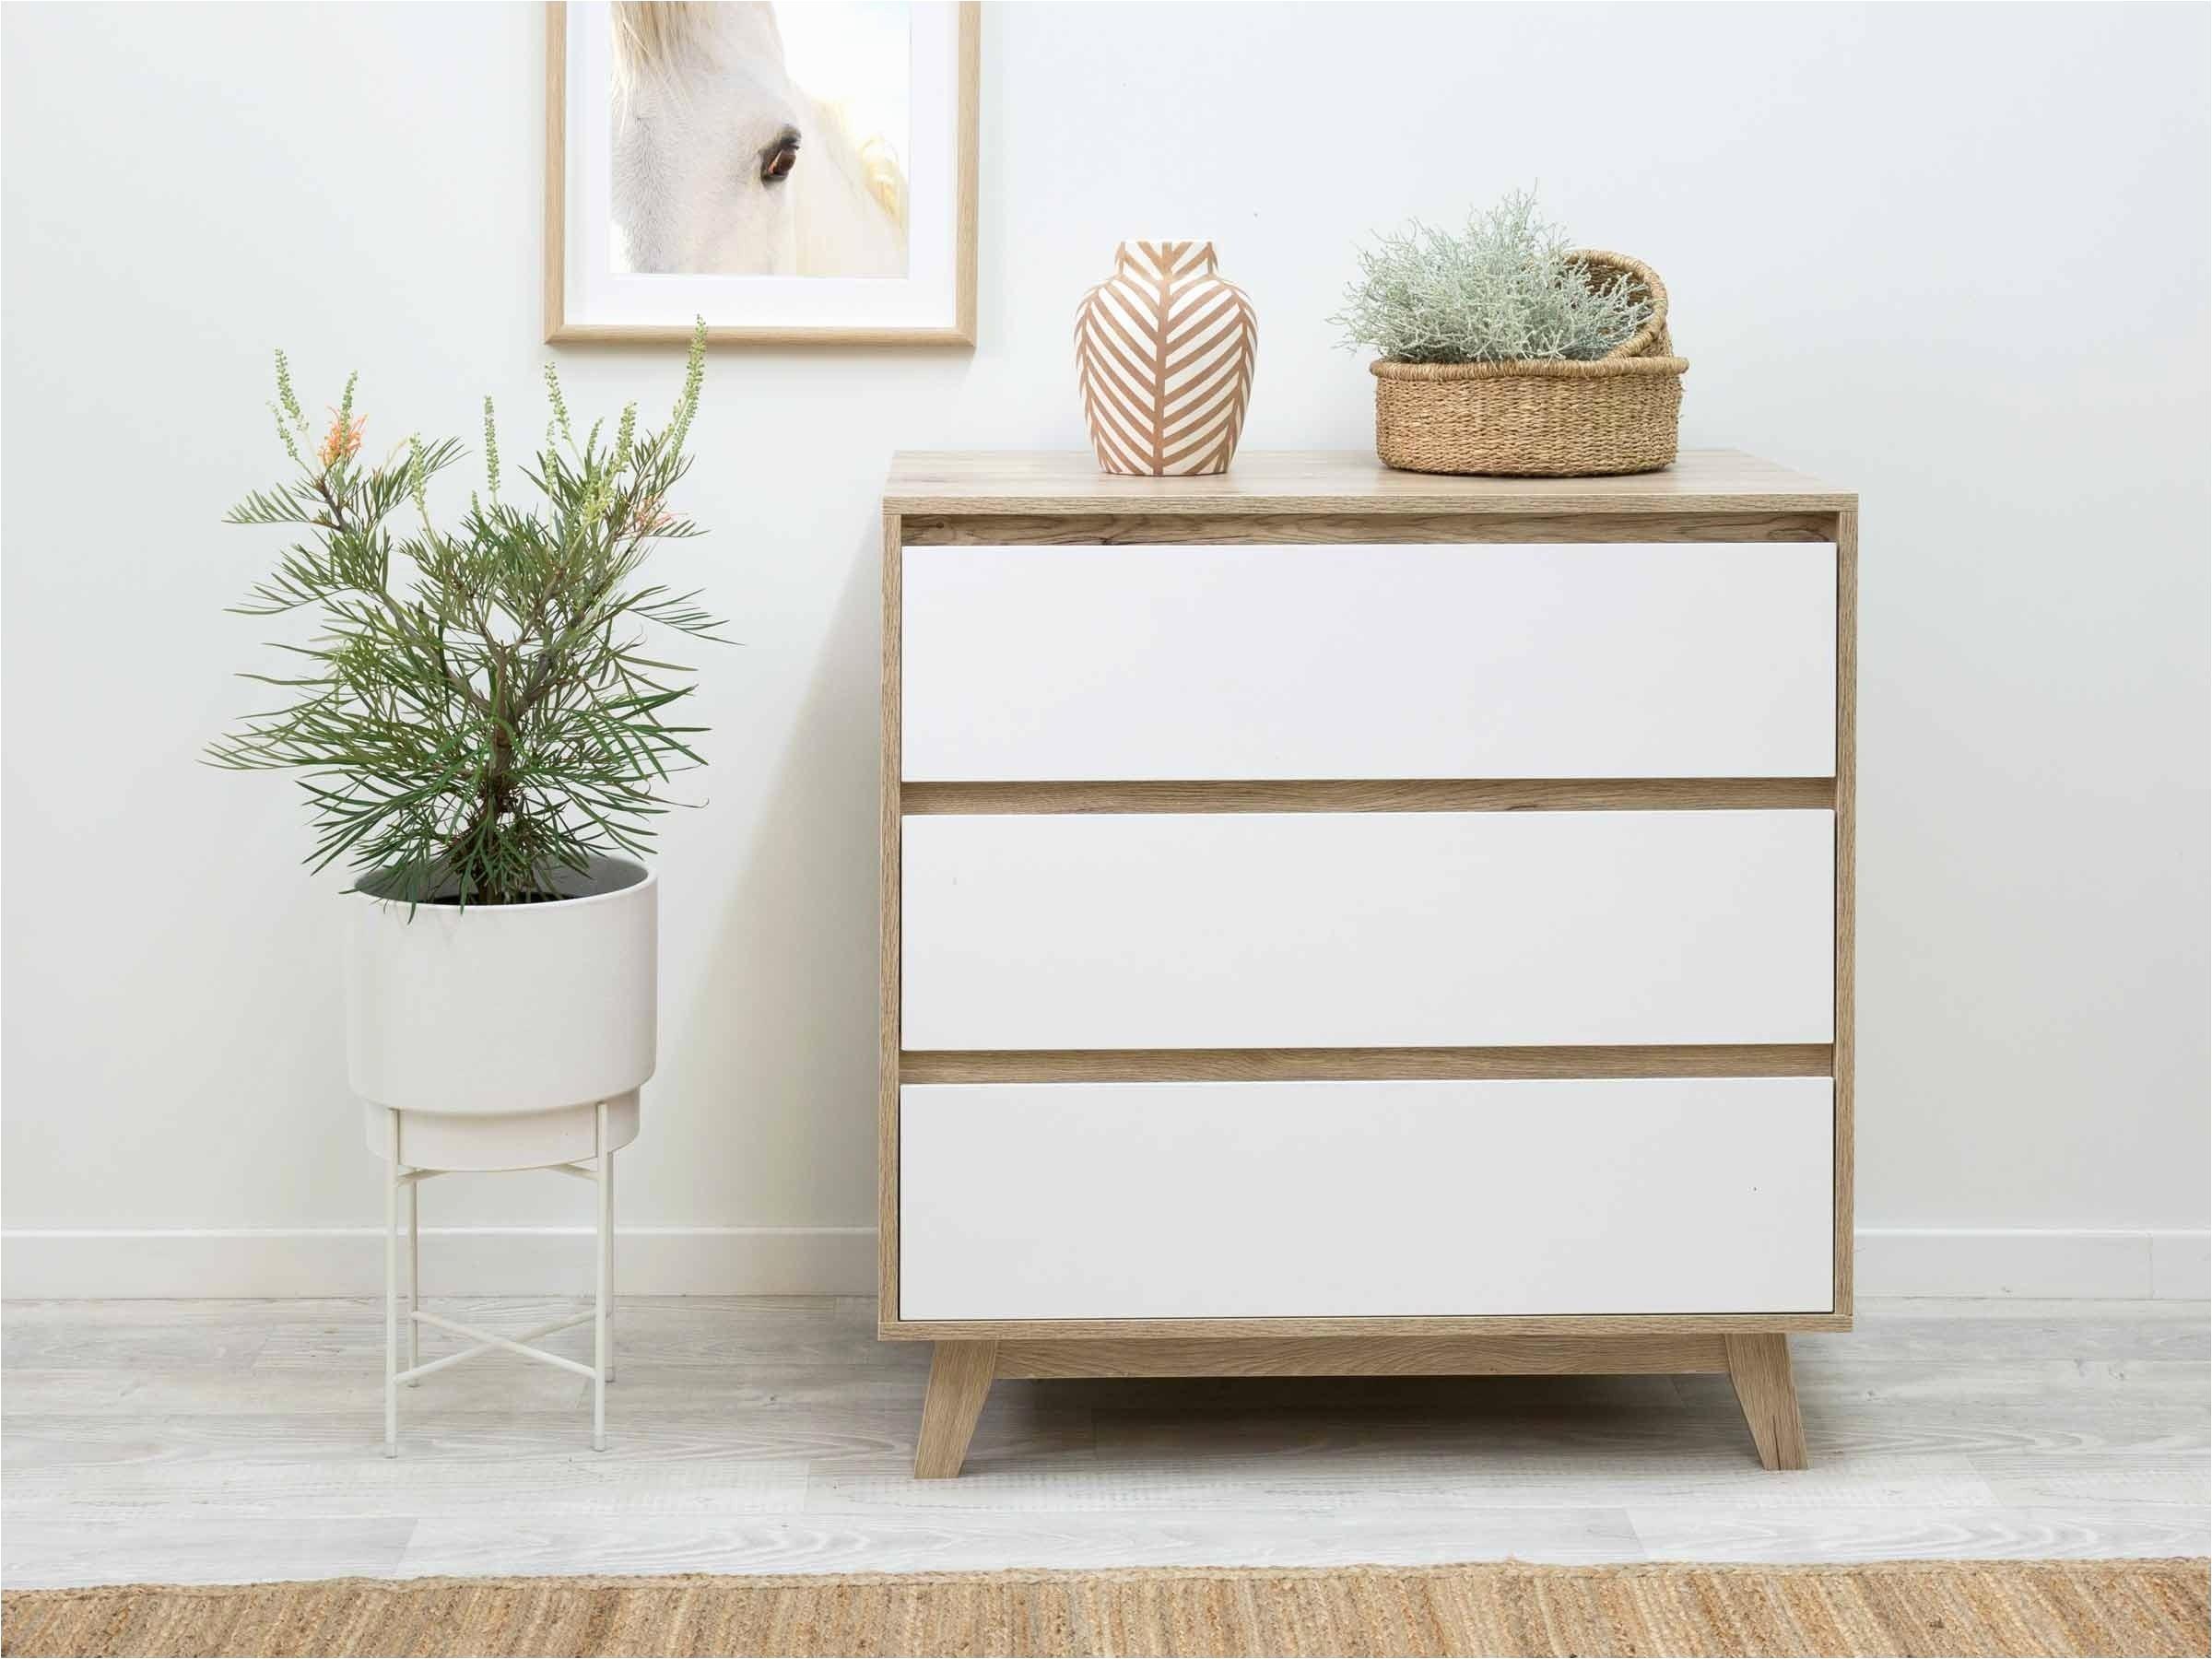 Pondarosa Furniture Home Design Pondarosa Furniture Awesome Furniture Ponderosa